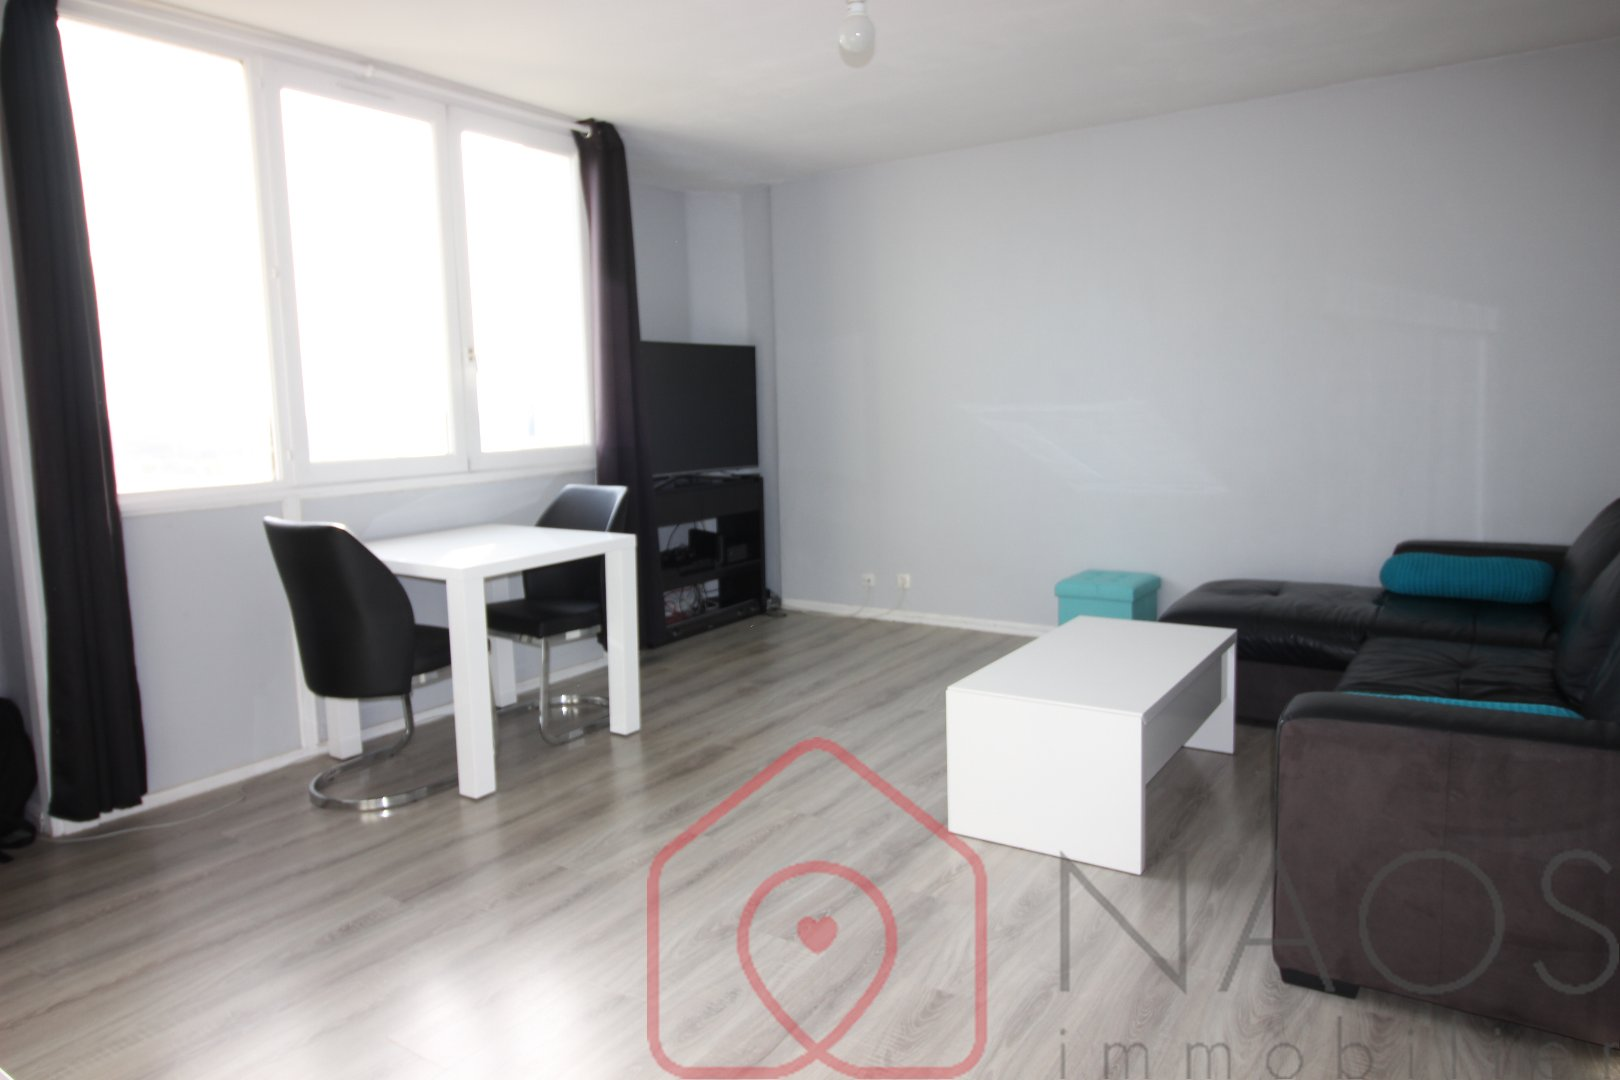 vente appartement 3 pièces MONS EN BAROEUL 59370